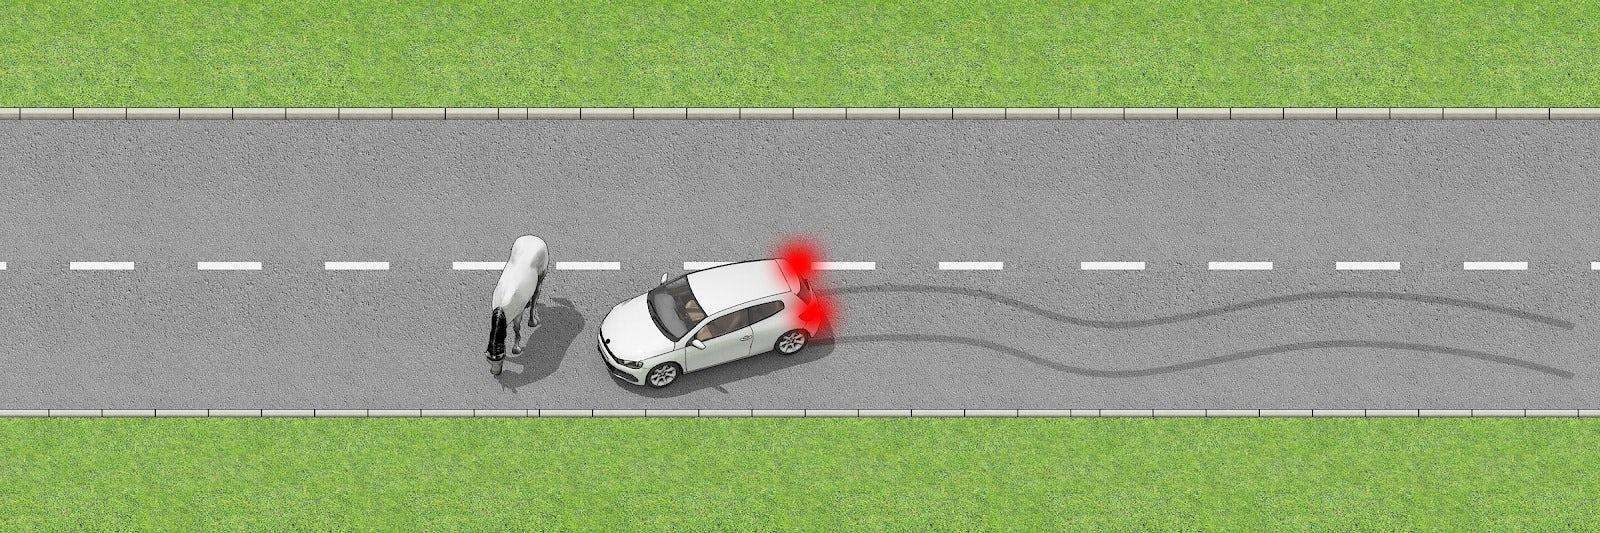 A CAR BRAKING FOR HAZARD ON ROAD